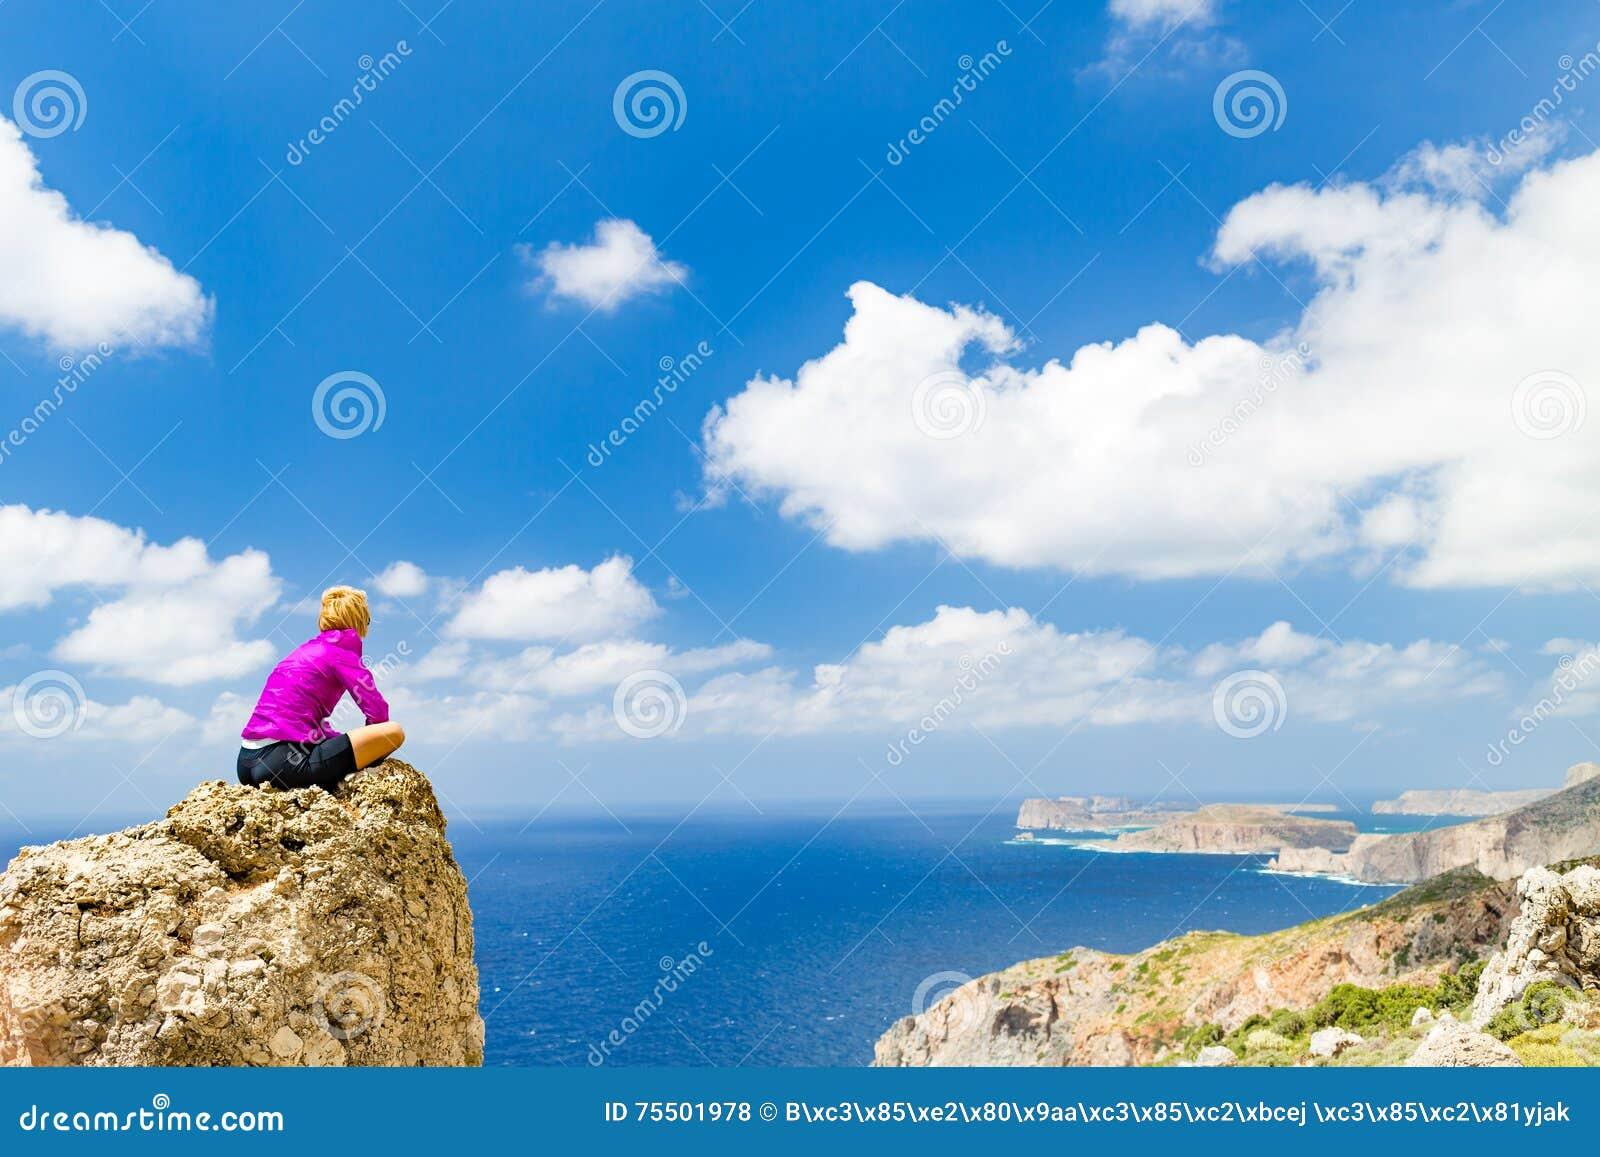 Woman overlooking Mediterranean Sea, Crete Island, Greece